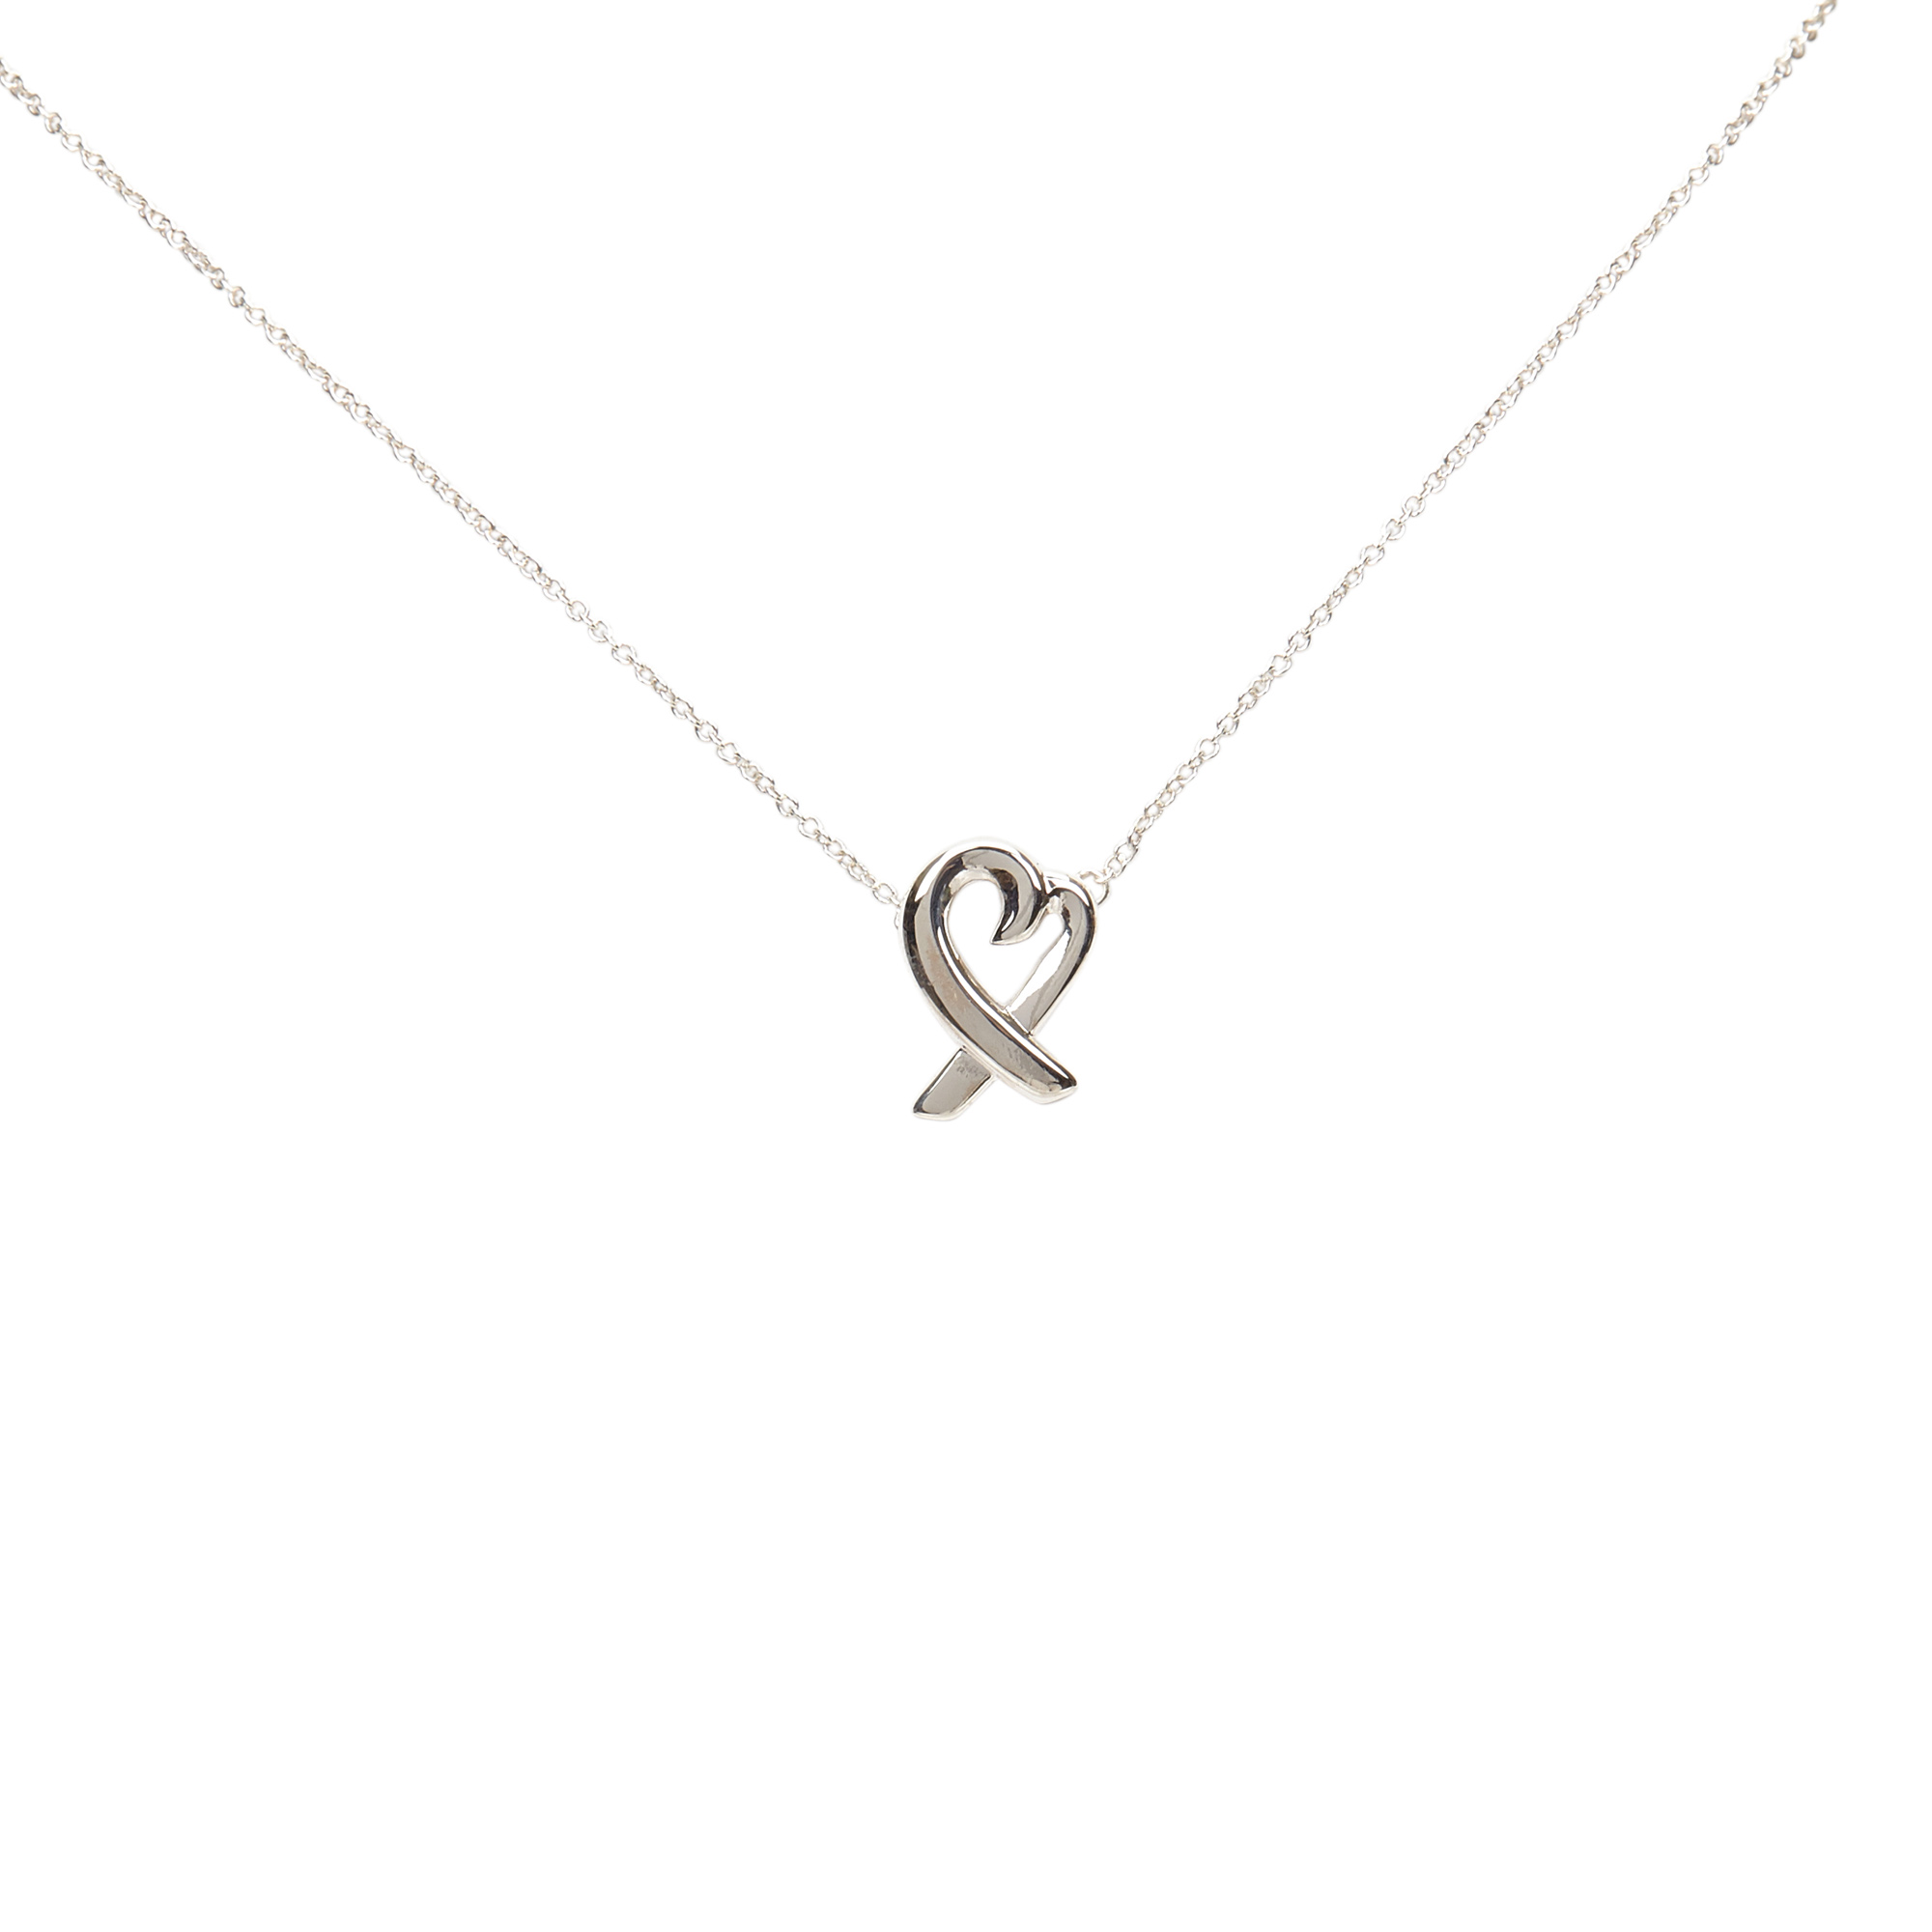 Tiffany & Co. Paloma Picasso Loving Heart Silver Pendant Necklace